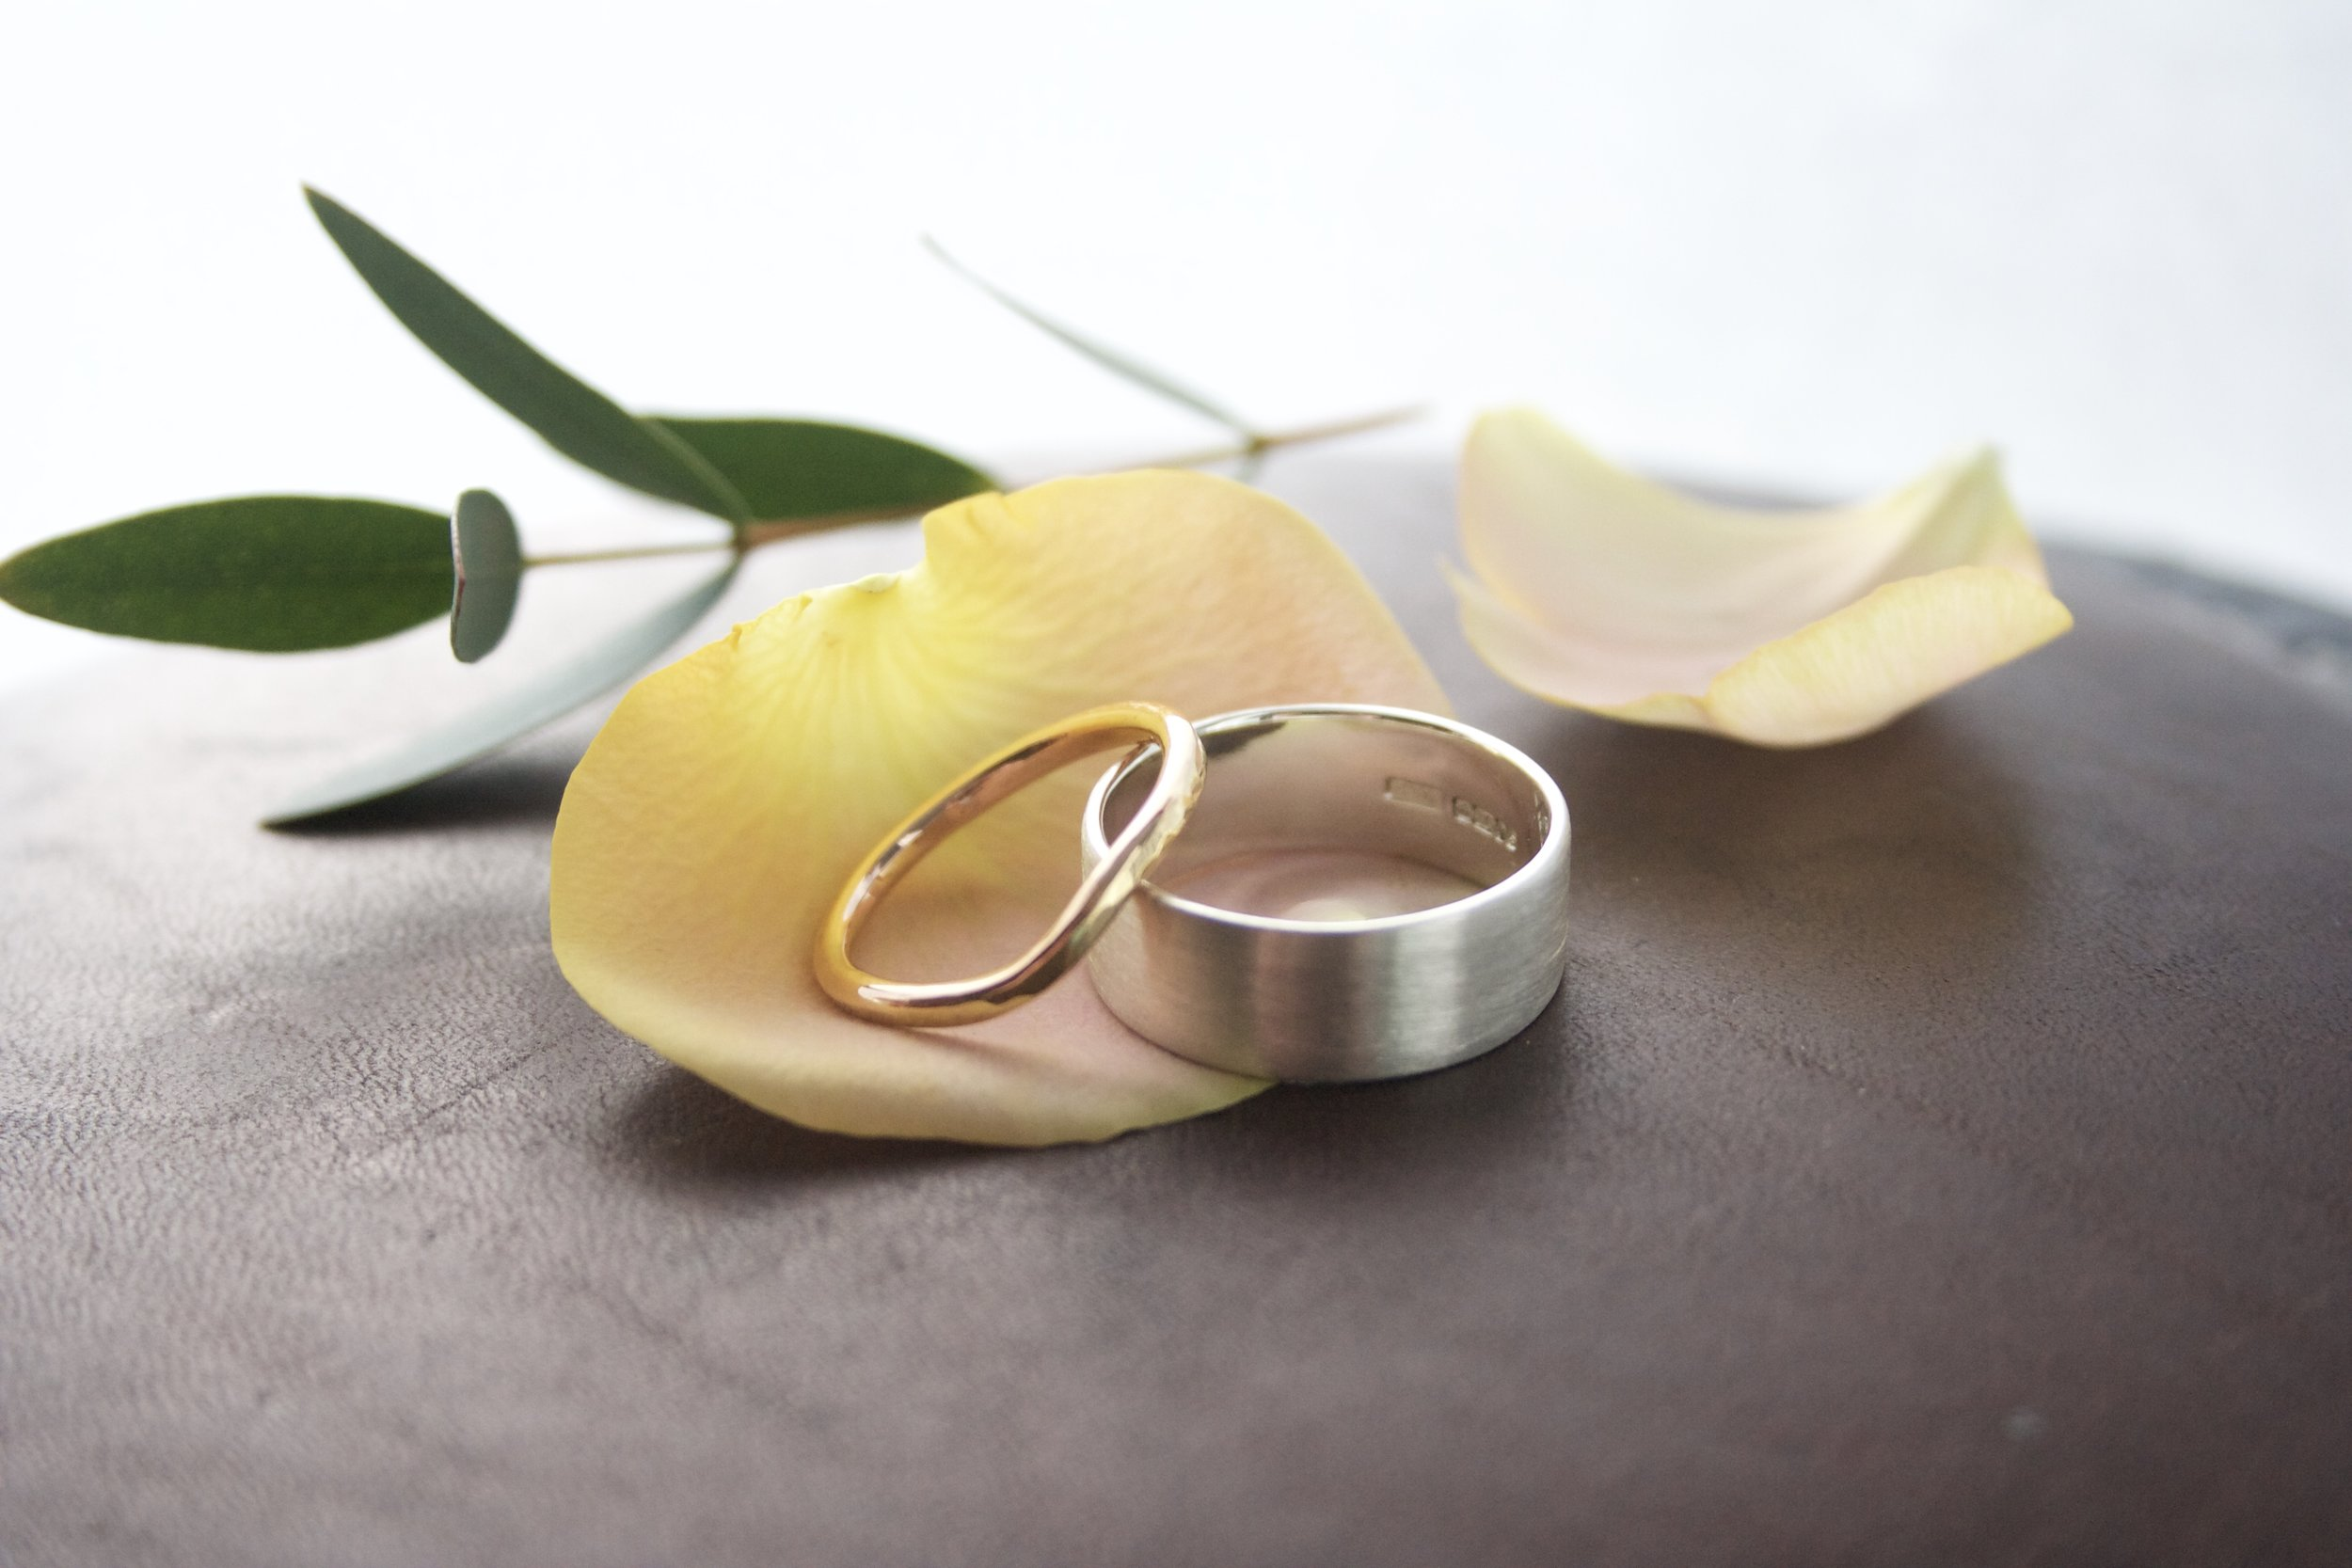 Wedding Rings workshop - gold rings handmade here by workshop participants.